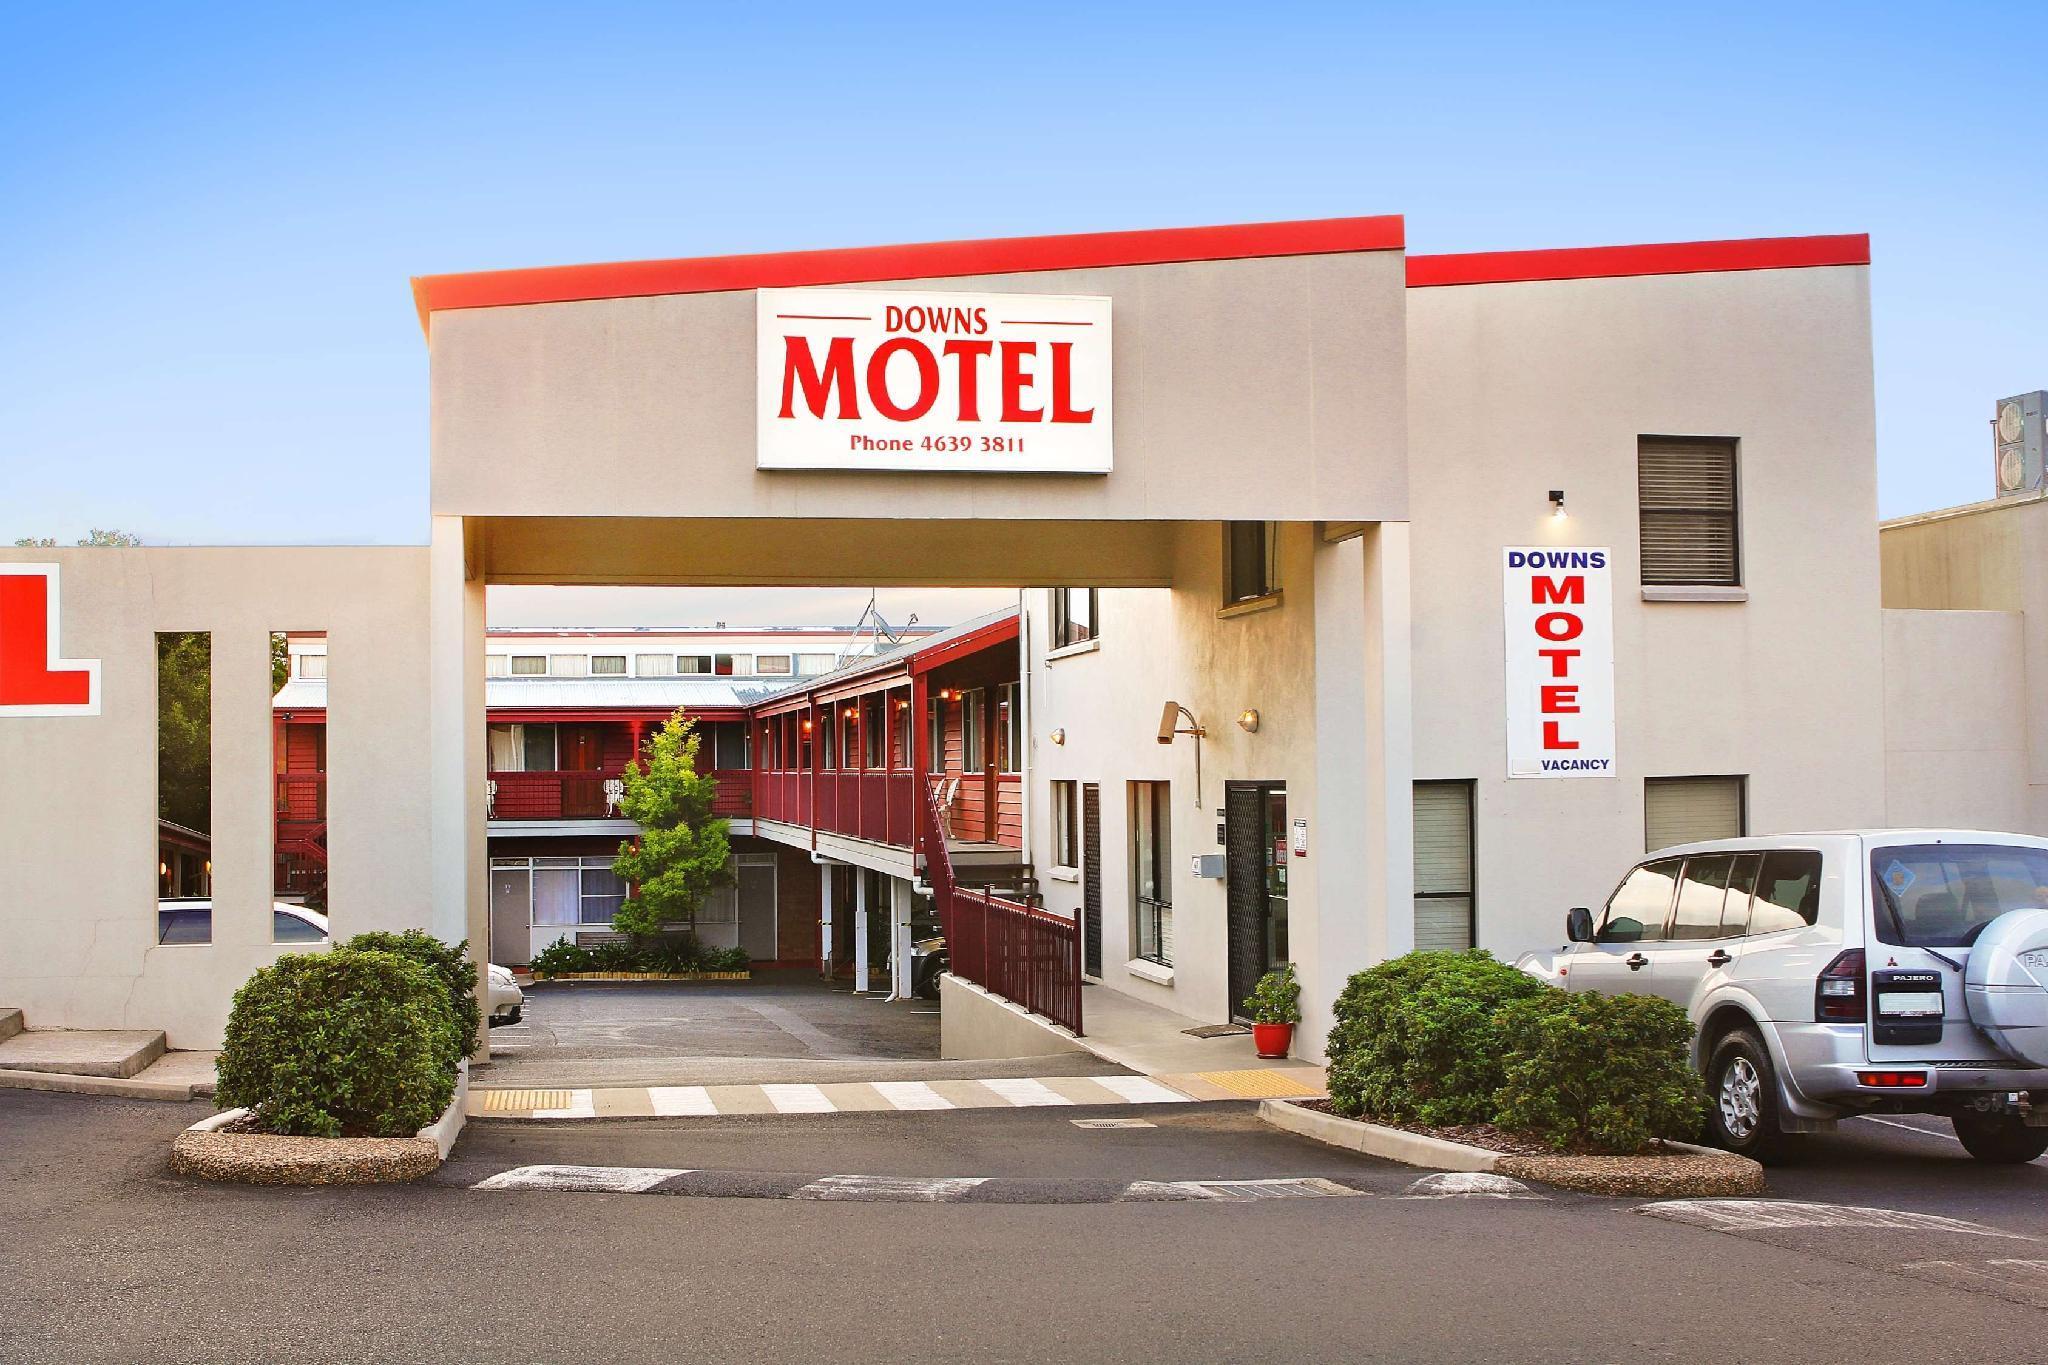 Downs Motel